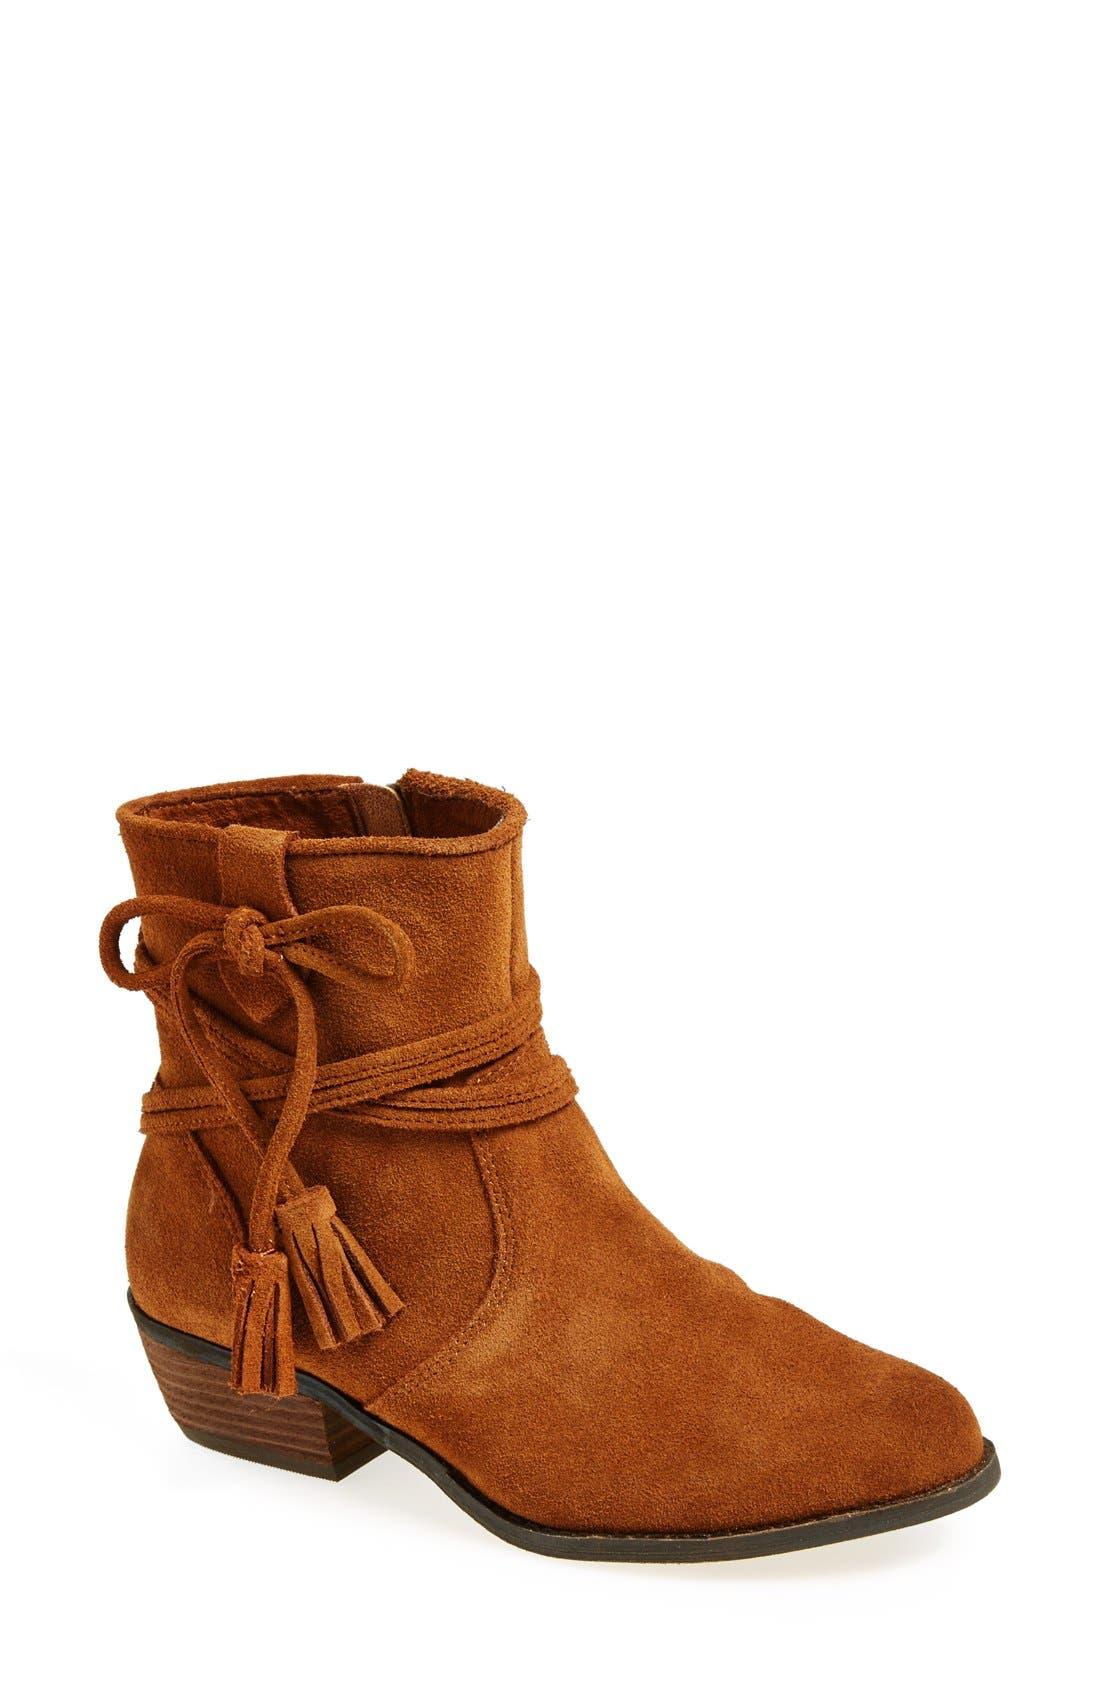 Alternate Image 1 Selected - Minnetonka 'Mesa' Boot (Women)